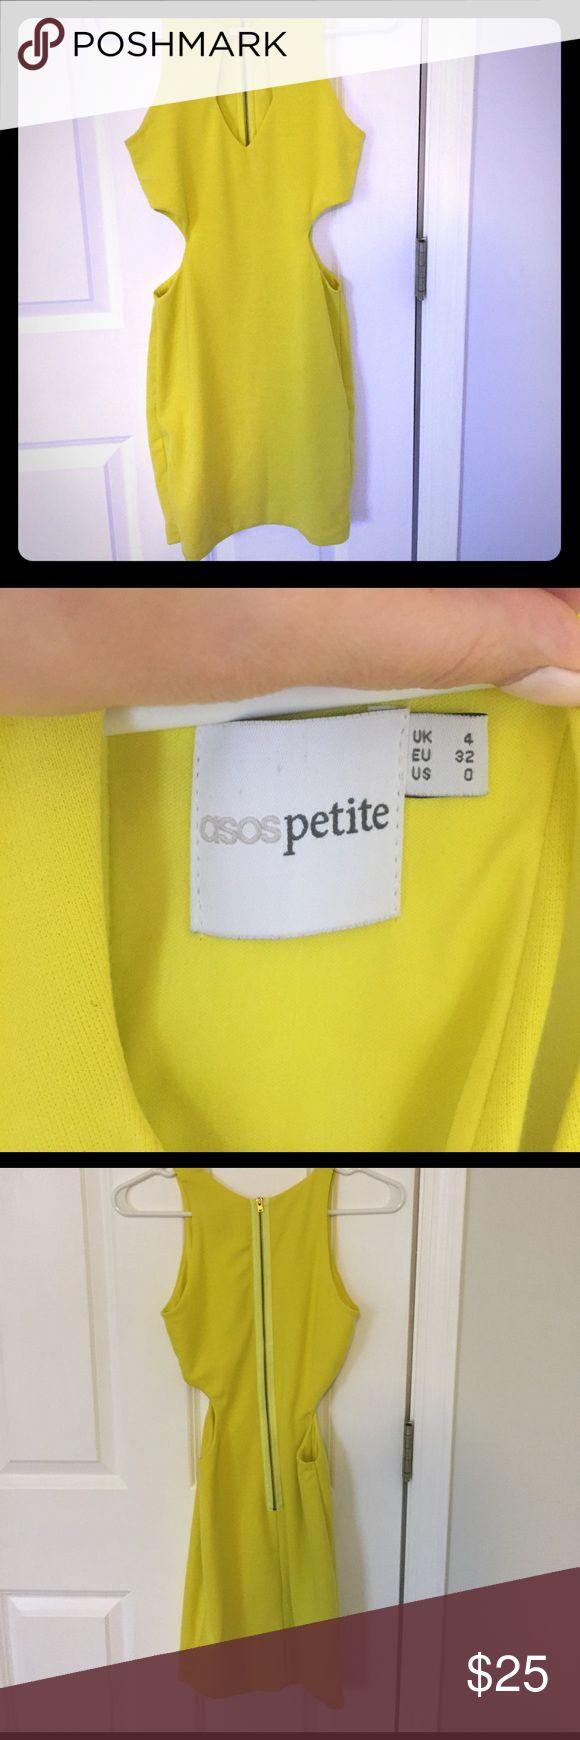 ASOS Petite Dress ASOS Petite bodycon dress with cutouts on the side. ASOS Petite Dresses Mini